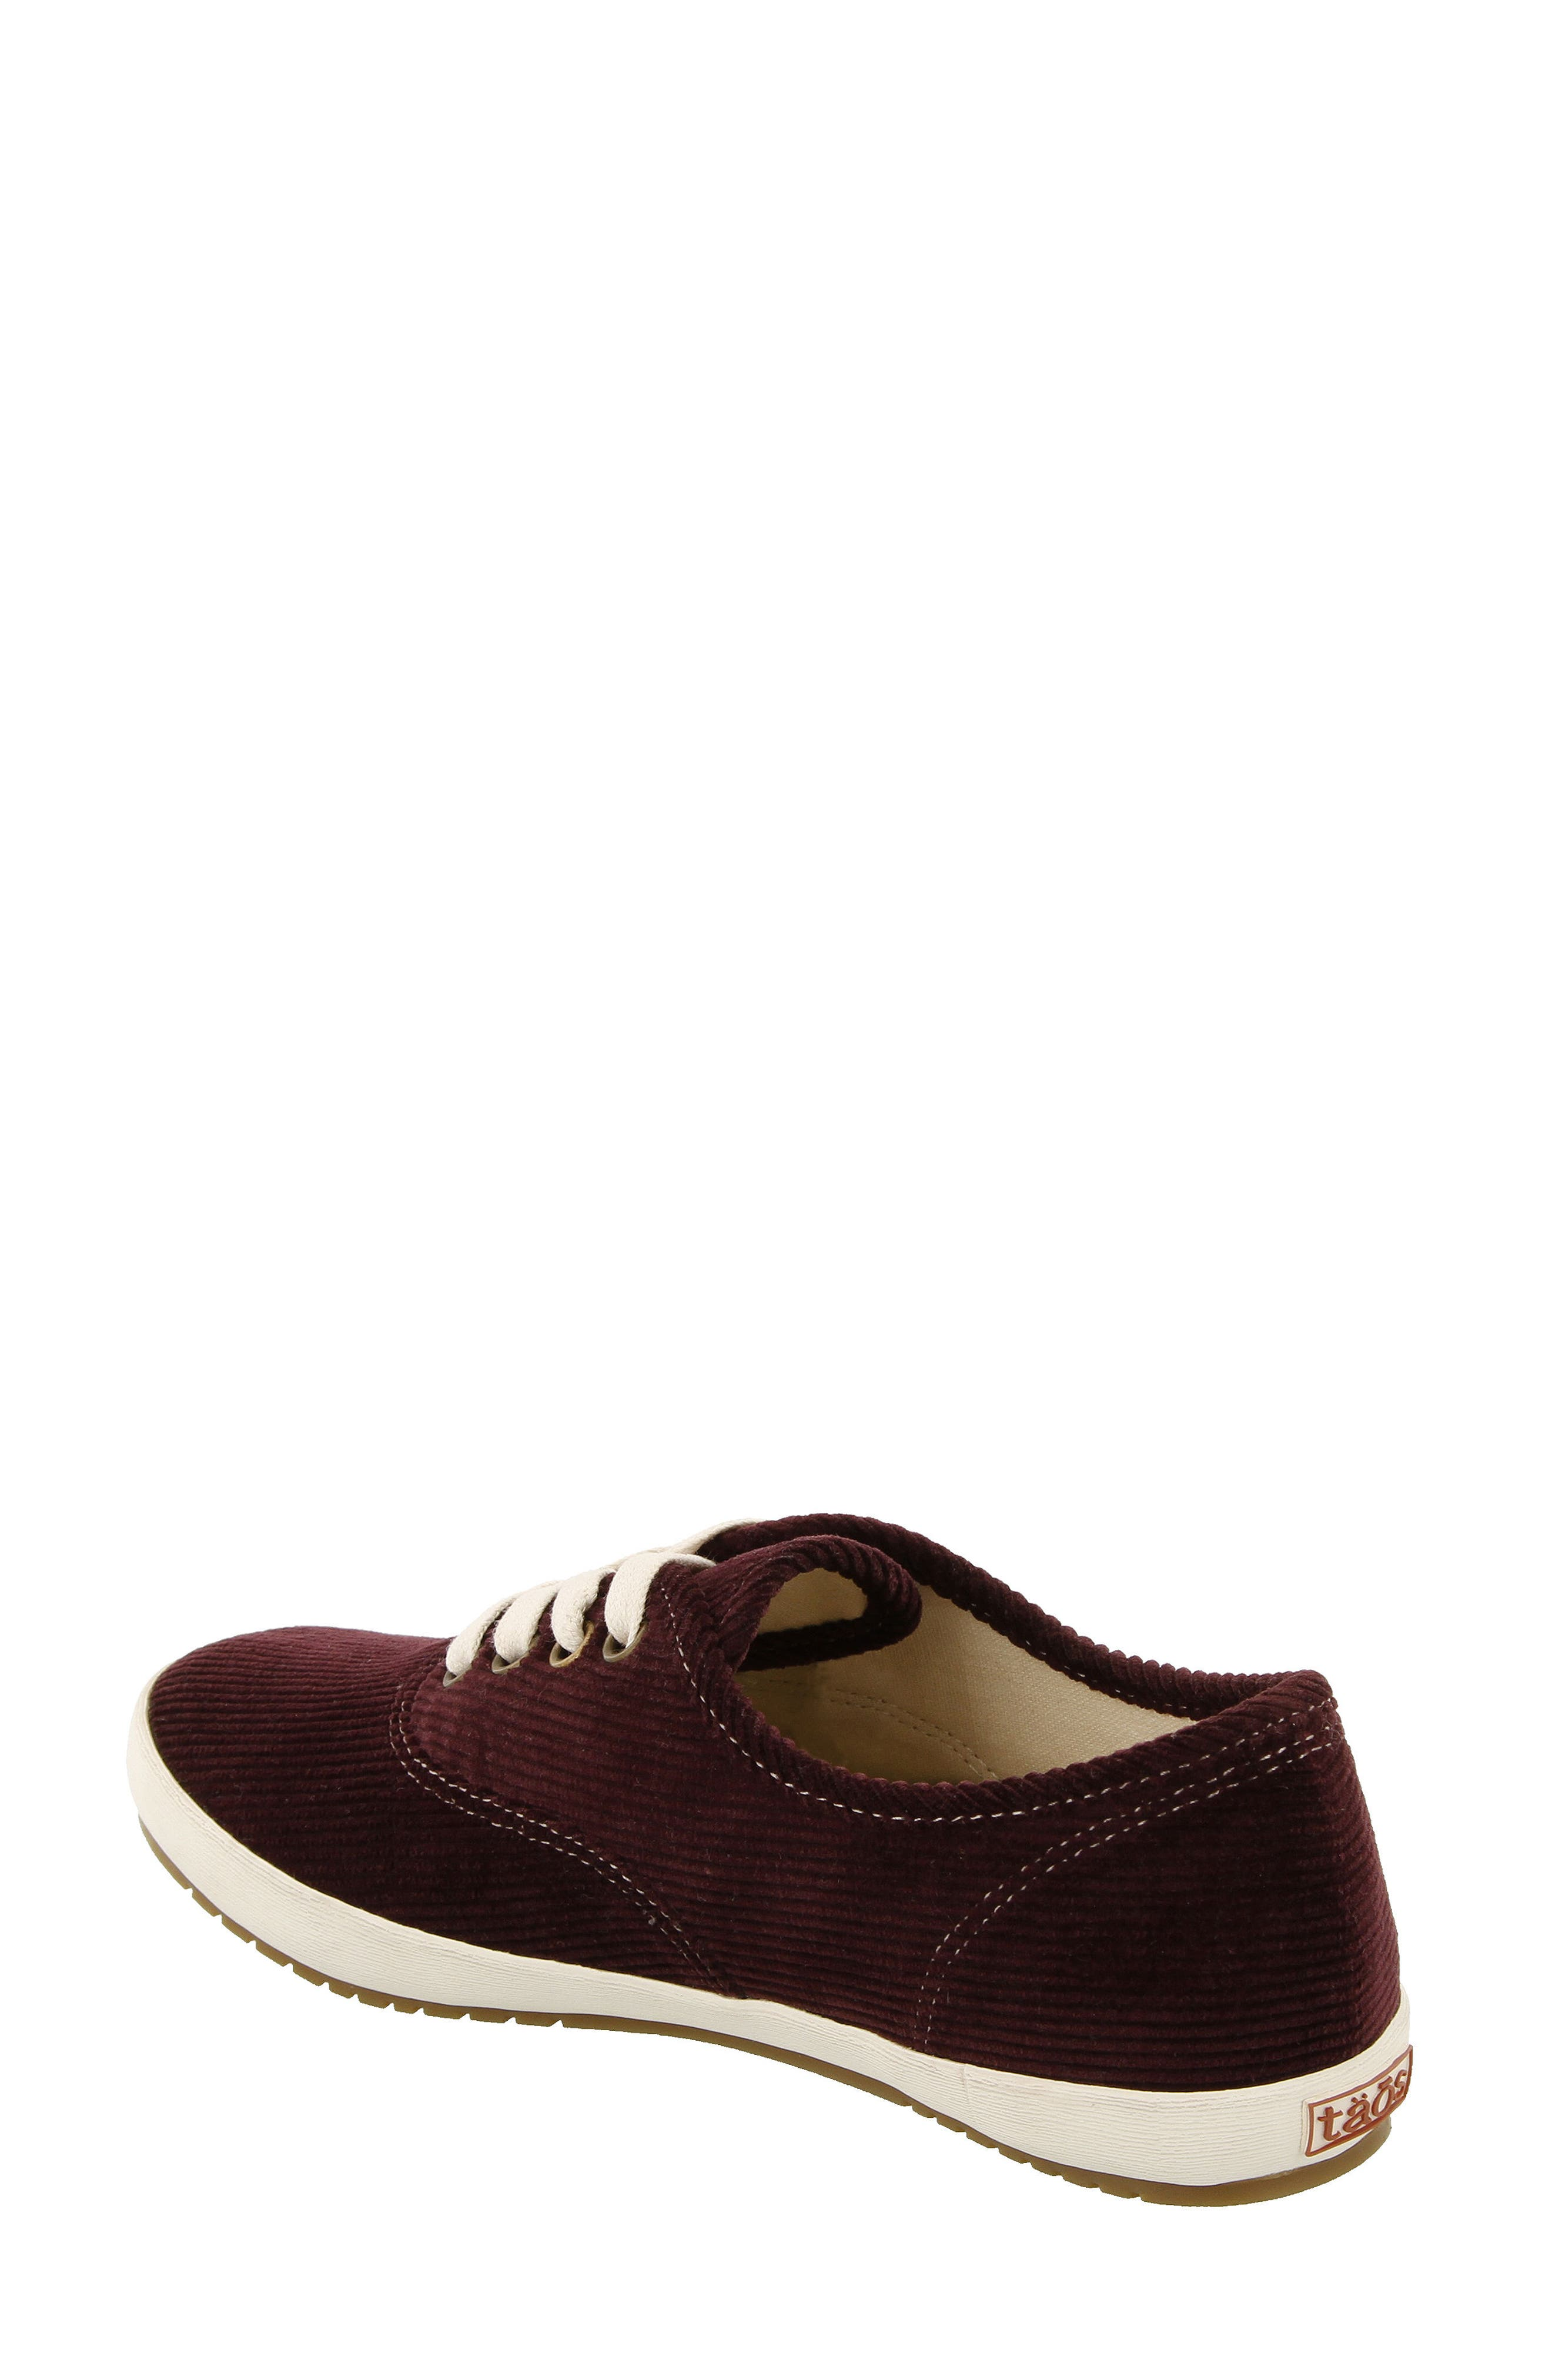 Guest Star Sneaker,                             Alternate thumbnail 2, color,                             Bordeaux Cord Fabric